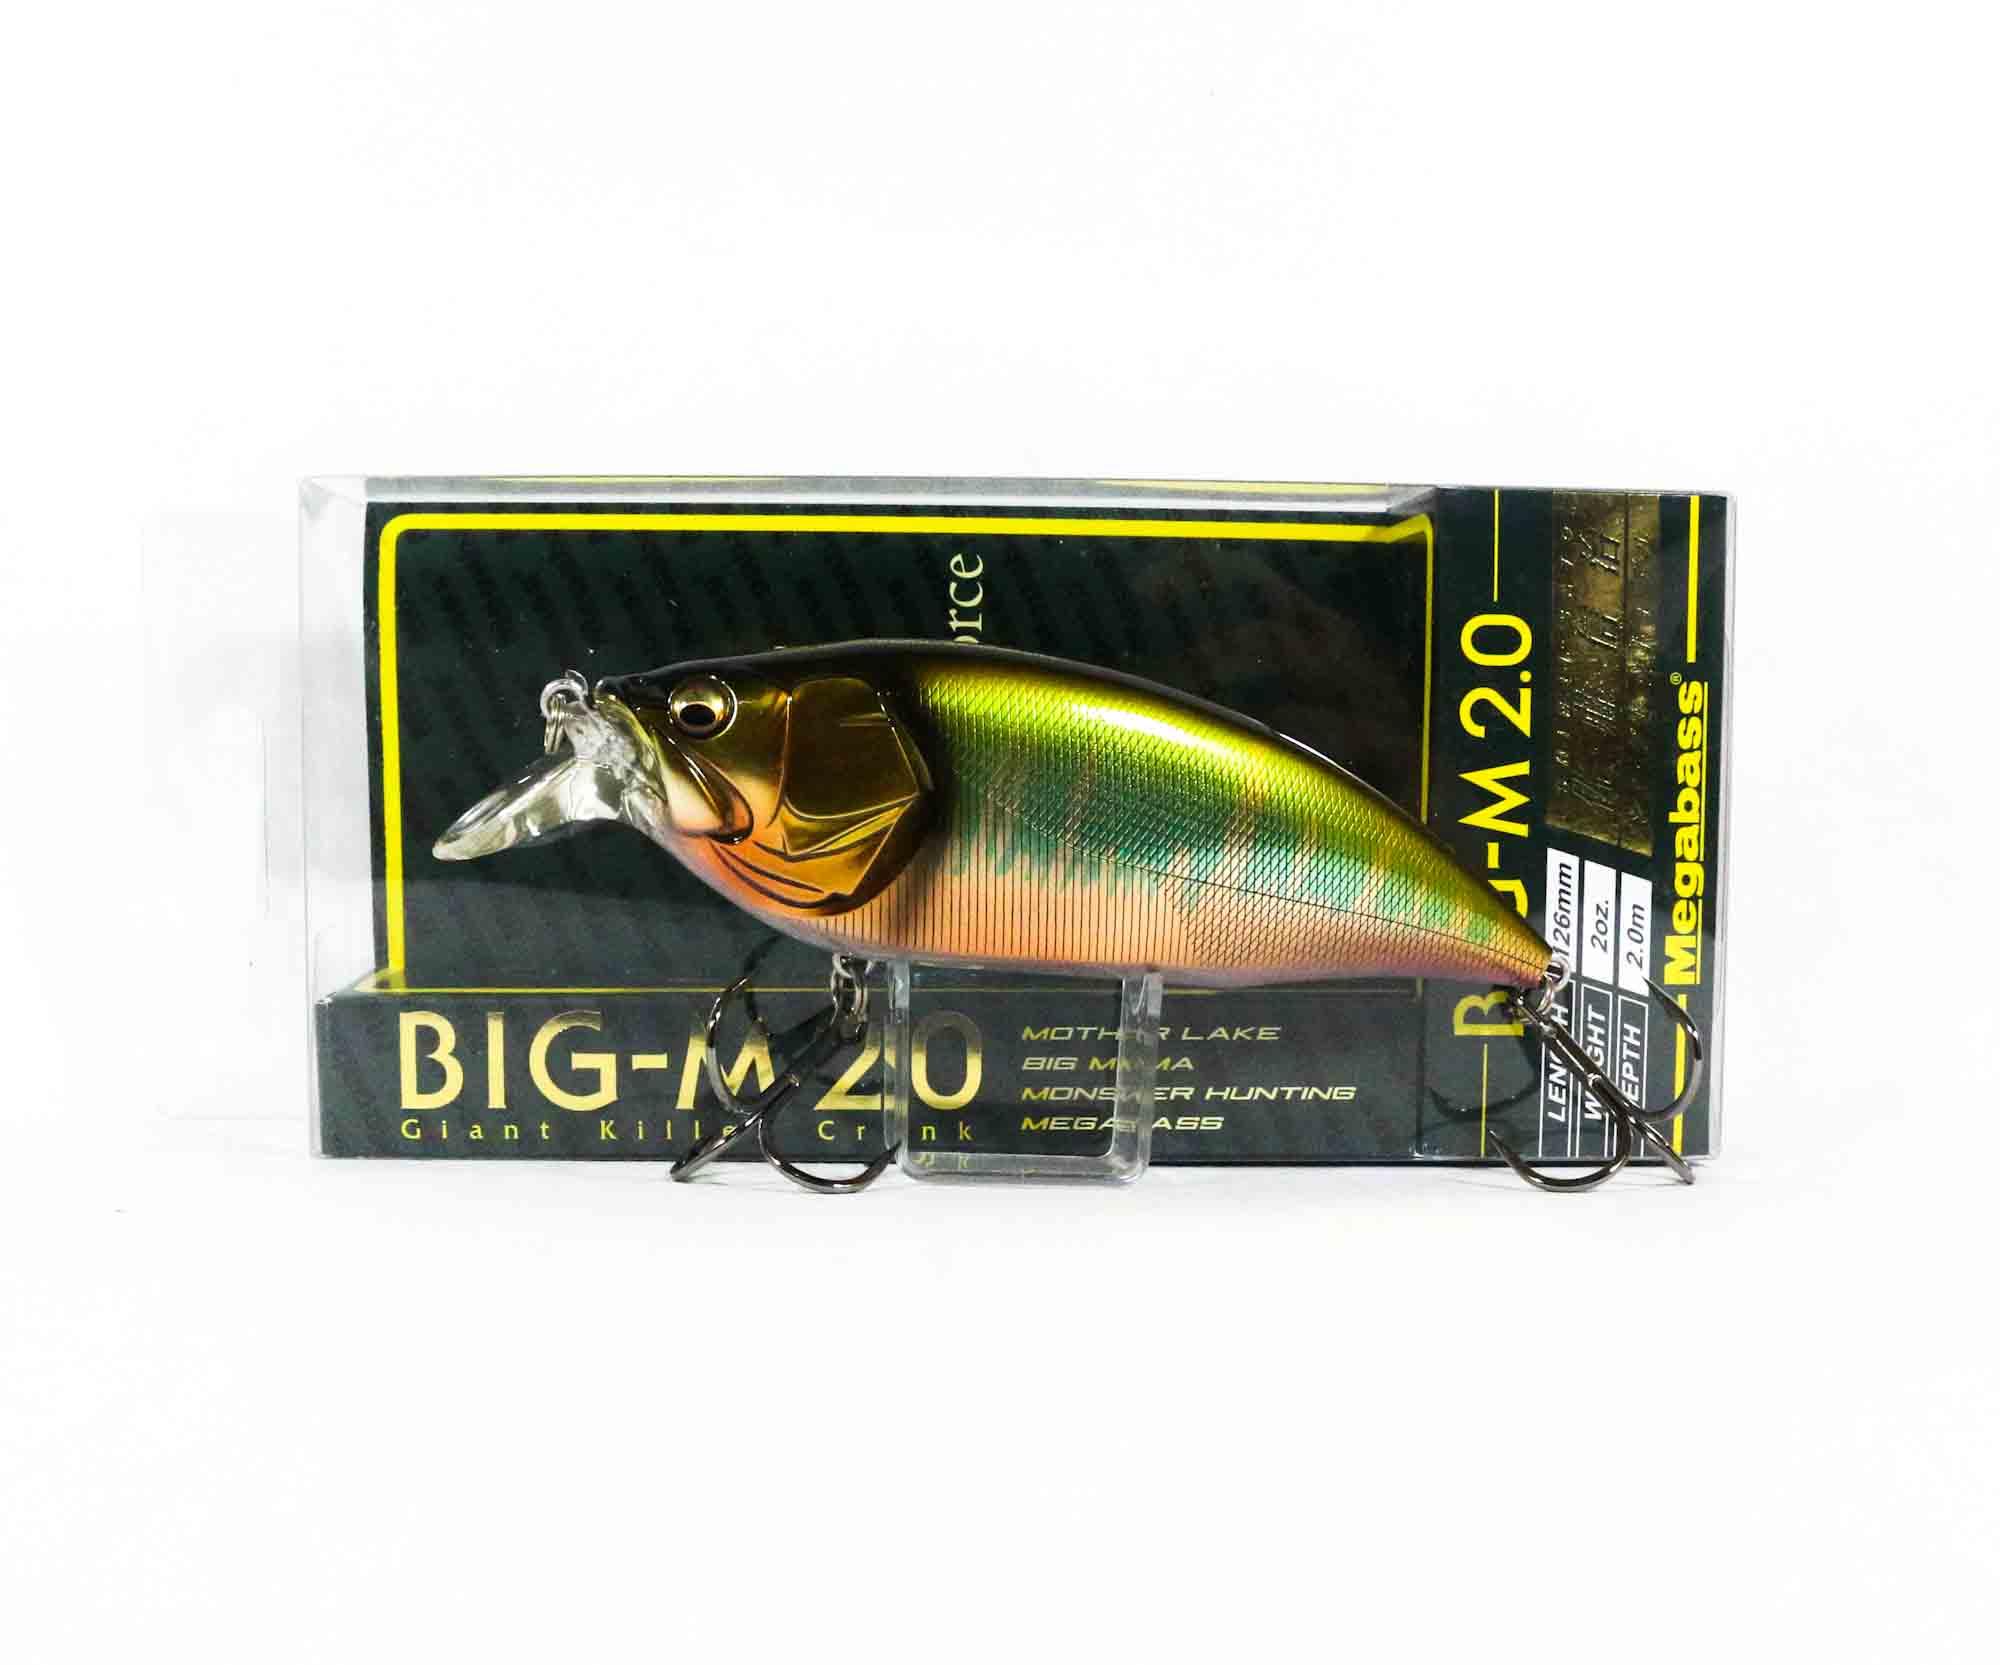 Megabass Big M 2.0 Giant Crank 126 mm Floating Lure Wagin OIkawa (6128)